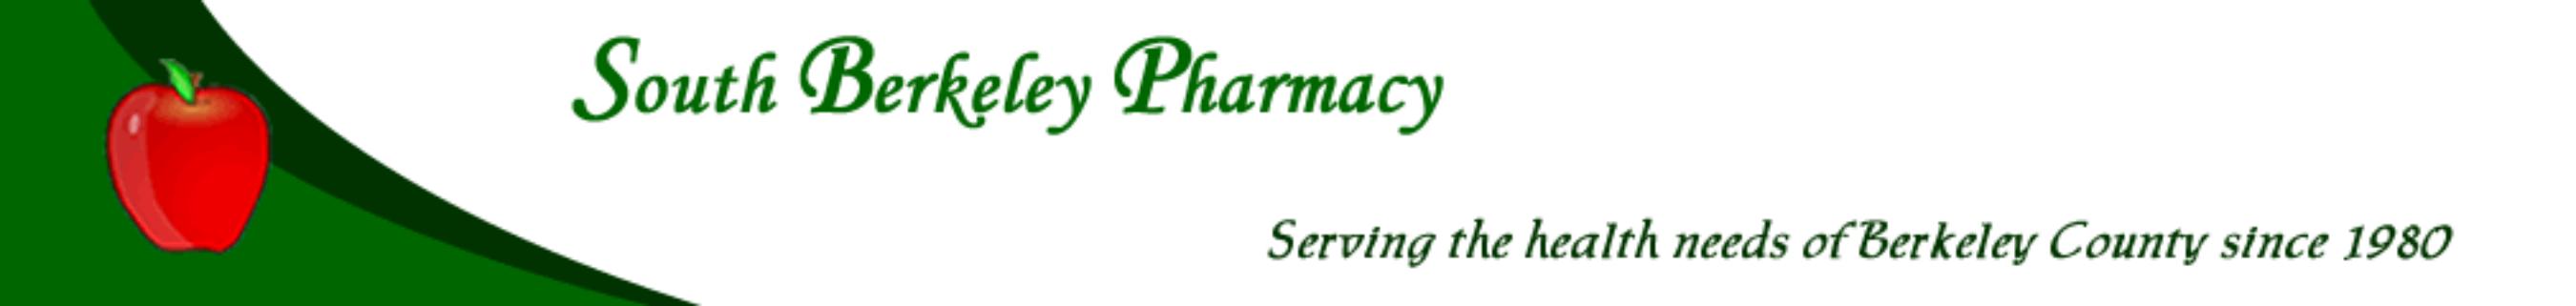 RI- South Berkeley Pharmacy